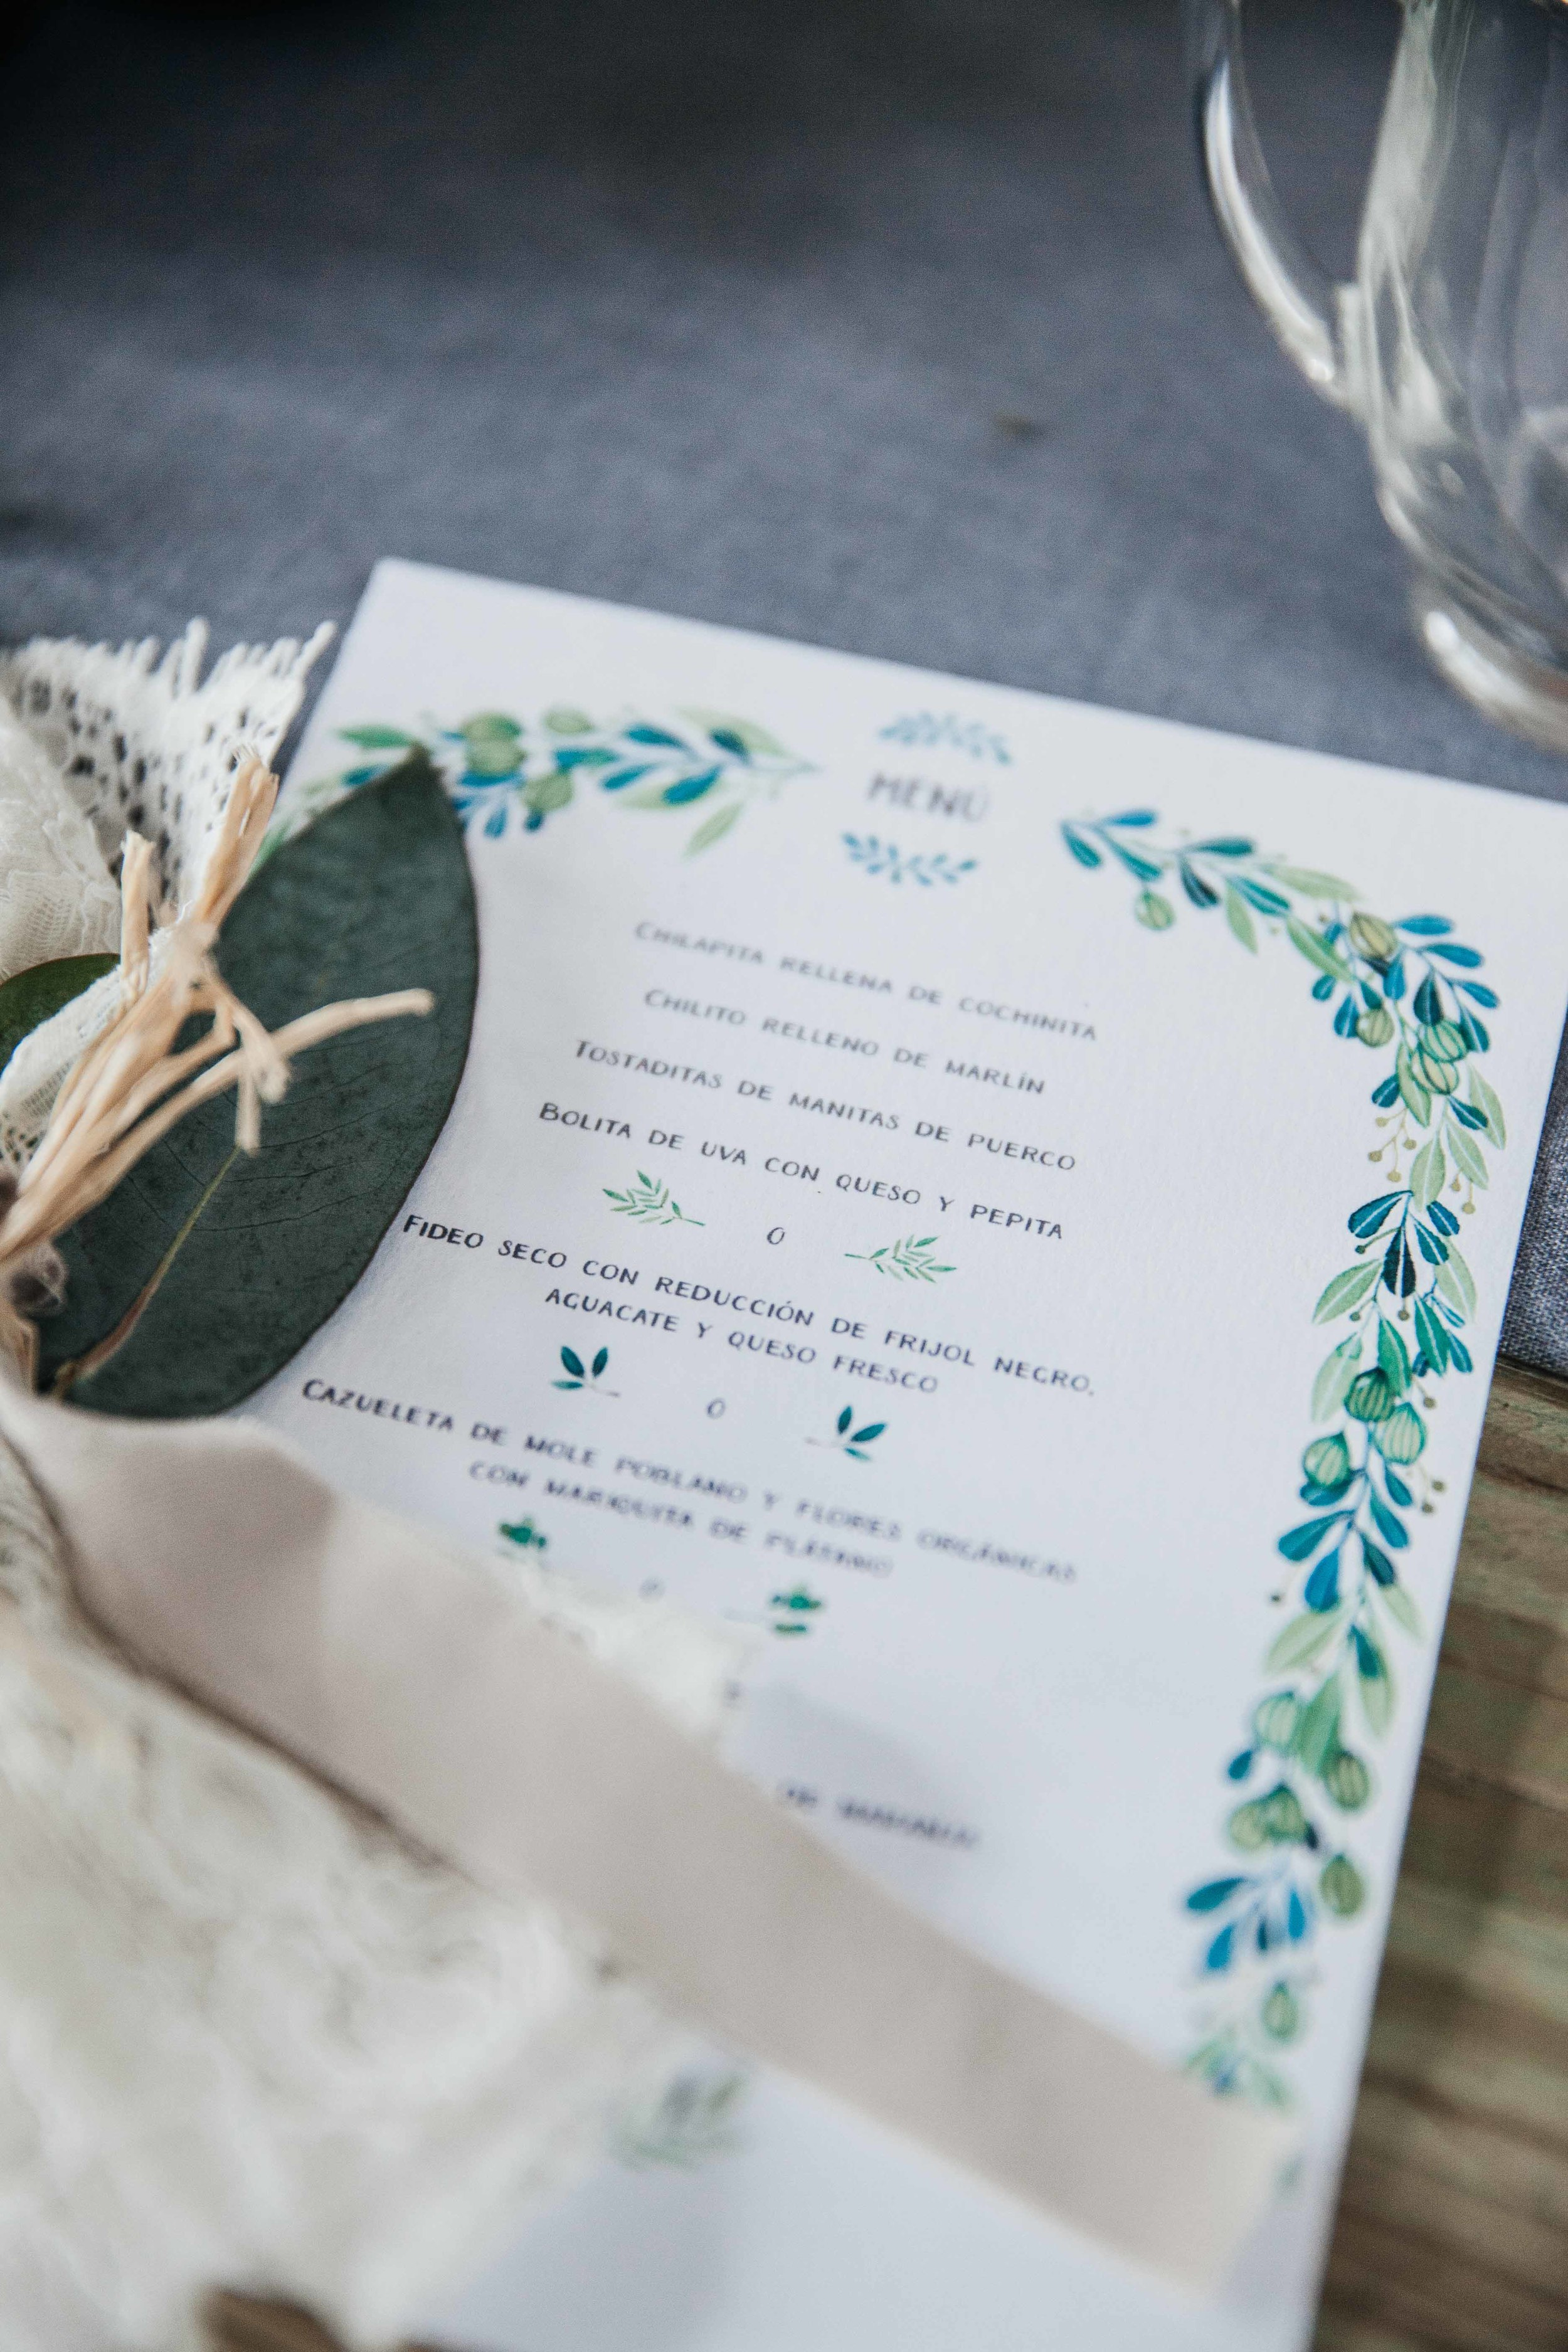 Happily Ever After menu, info events@anavictoriacalderon.com